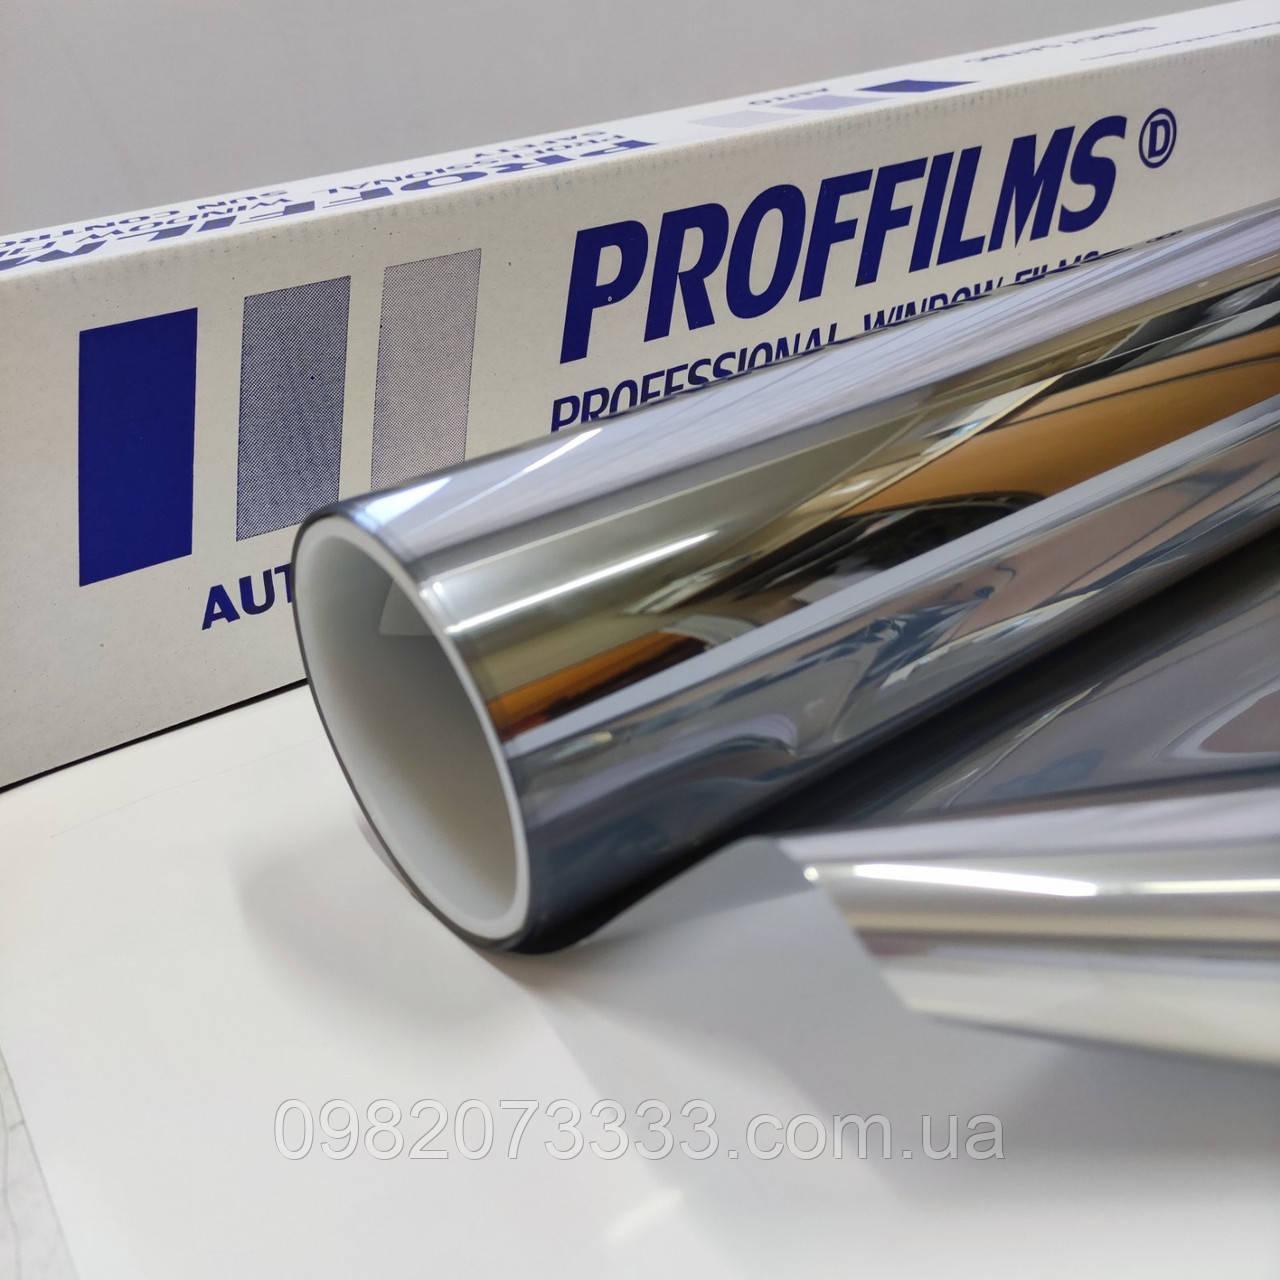 Солнцезащитная плёнка PROFFILMS Silver 35 зеркальная для тонировки окон ширина рулона 1,524 цена за кв.м.